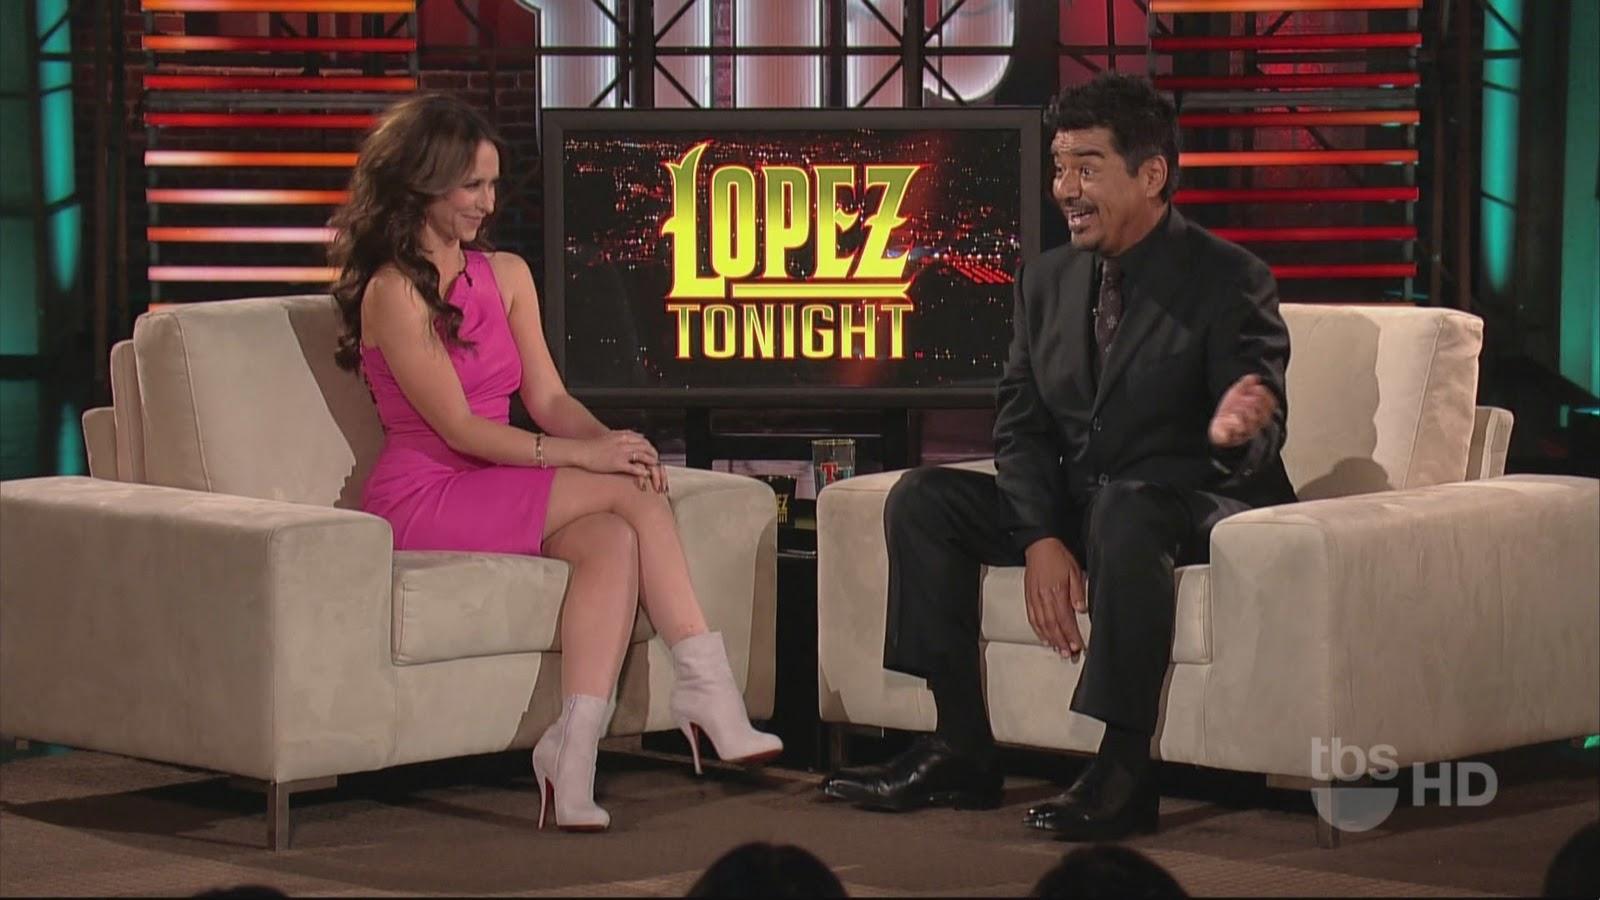 Jennifer Love Hewitt Lopez Tonight - January naked (53 pic)